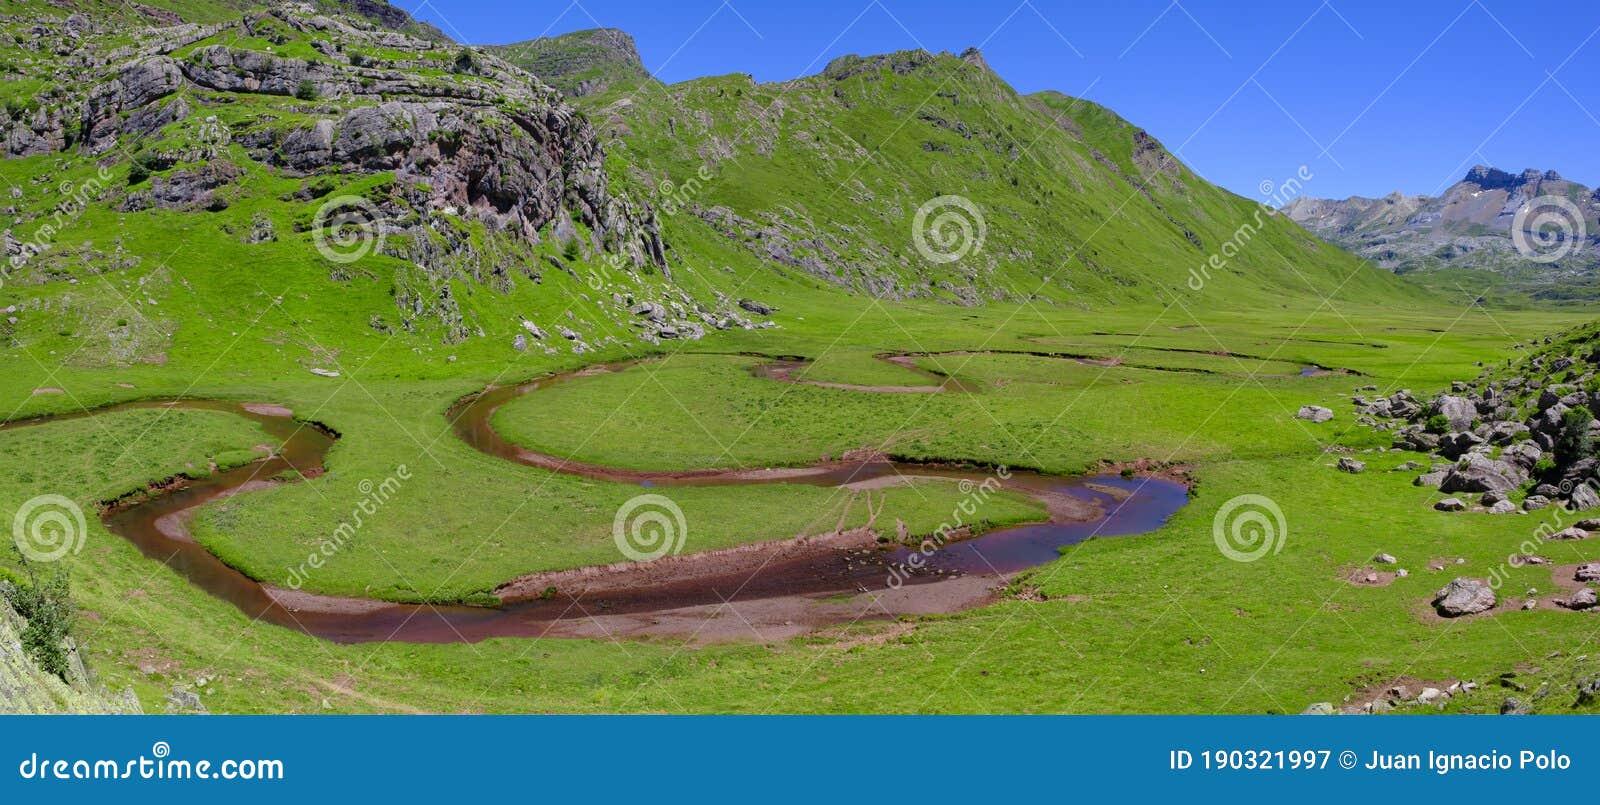 Meander In Aguastuertas Selva De Oza Huesca Pyrenees Stock Image Image Of Mountain Huesca 190321997